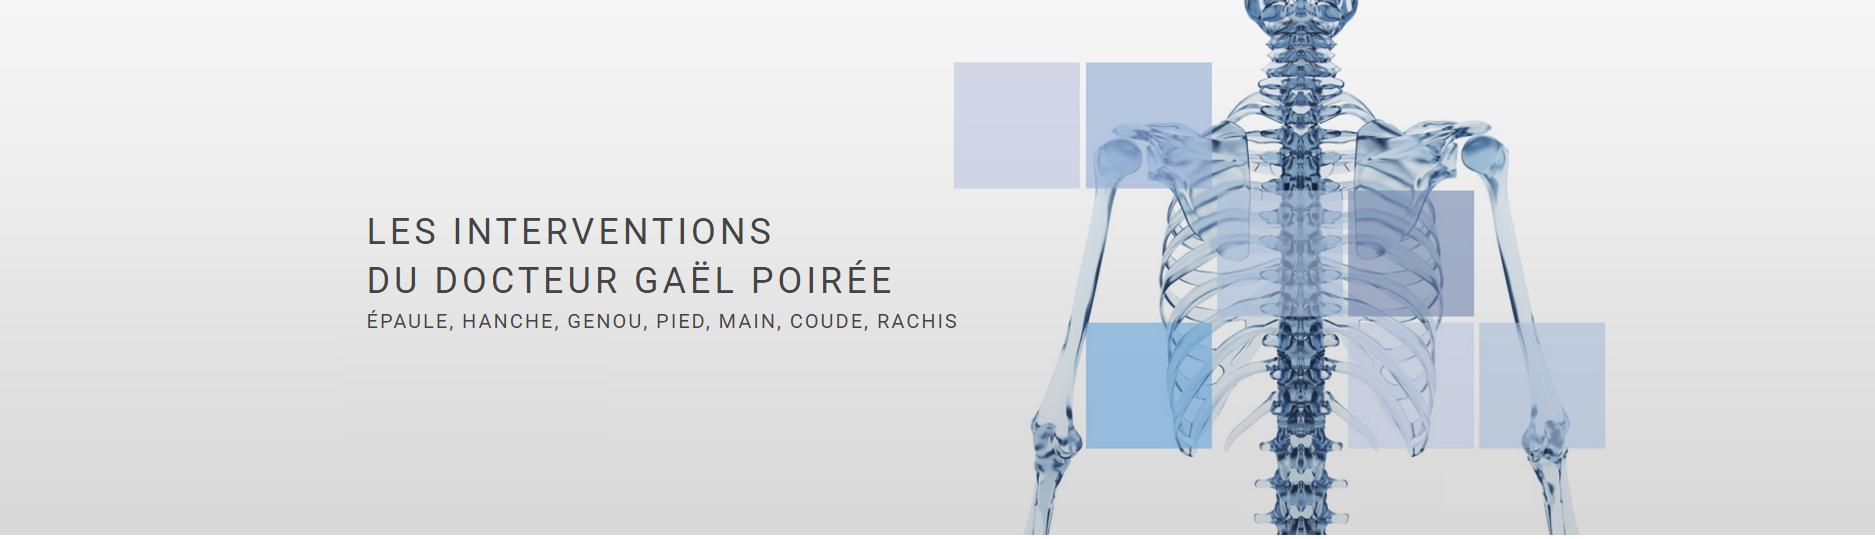 chirurgie-orthopedique-traumatologie-nice-docteur-gael-poiree-s11